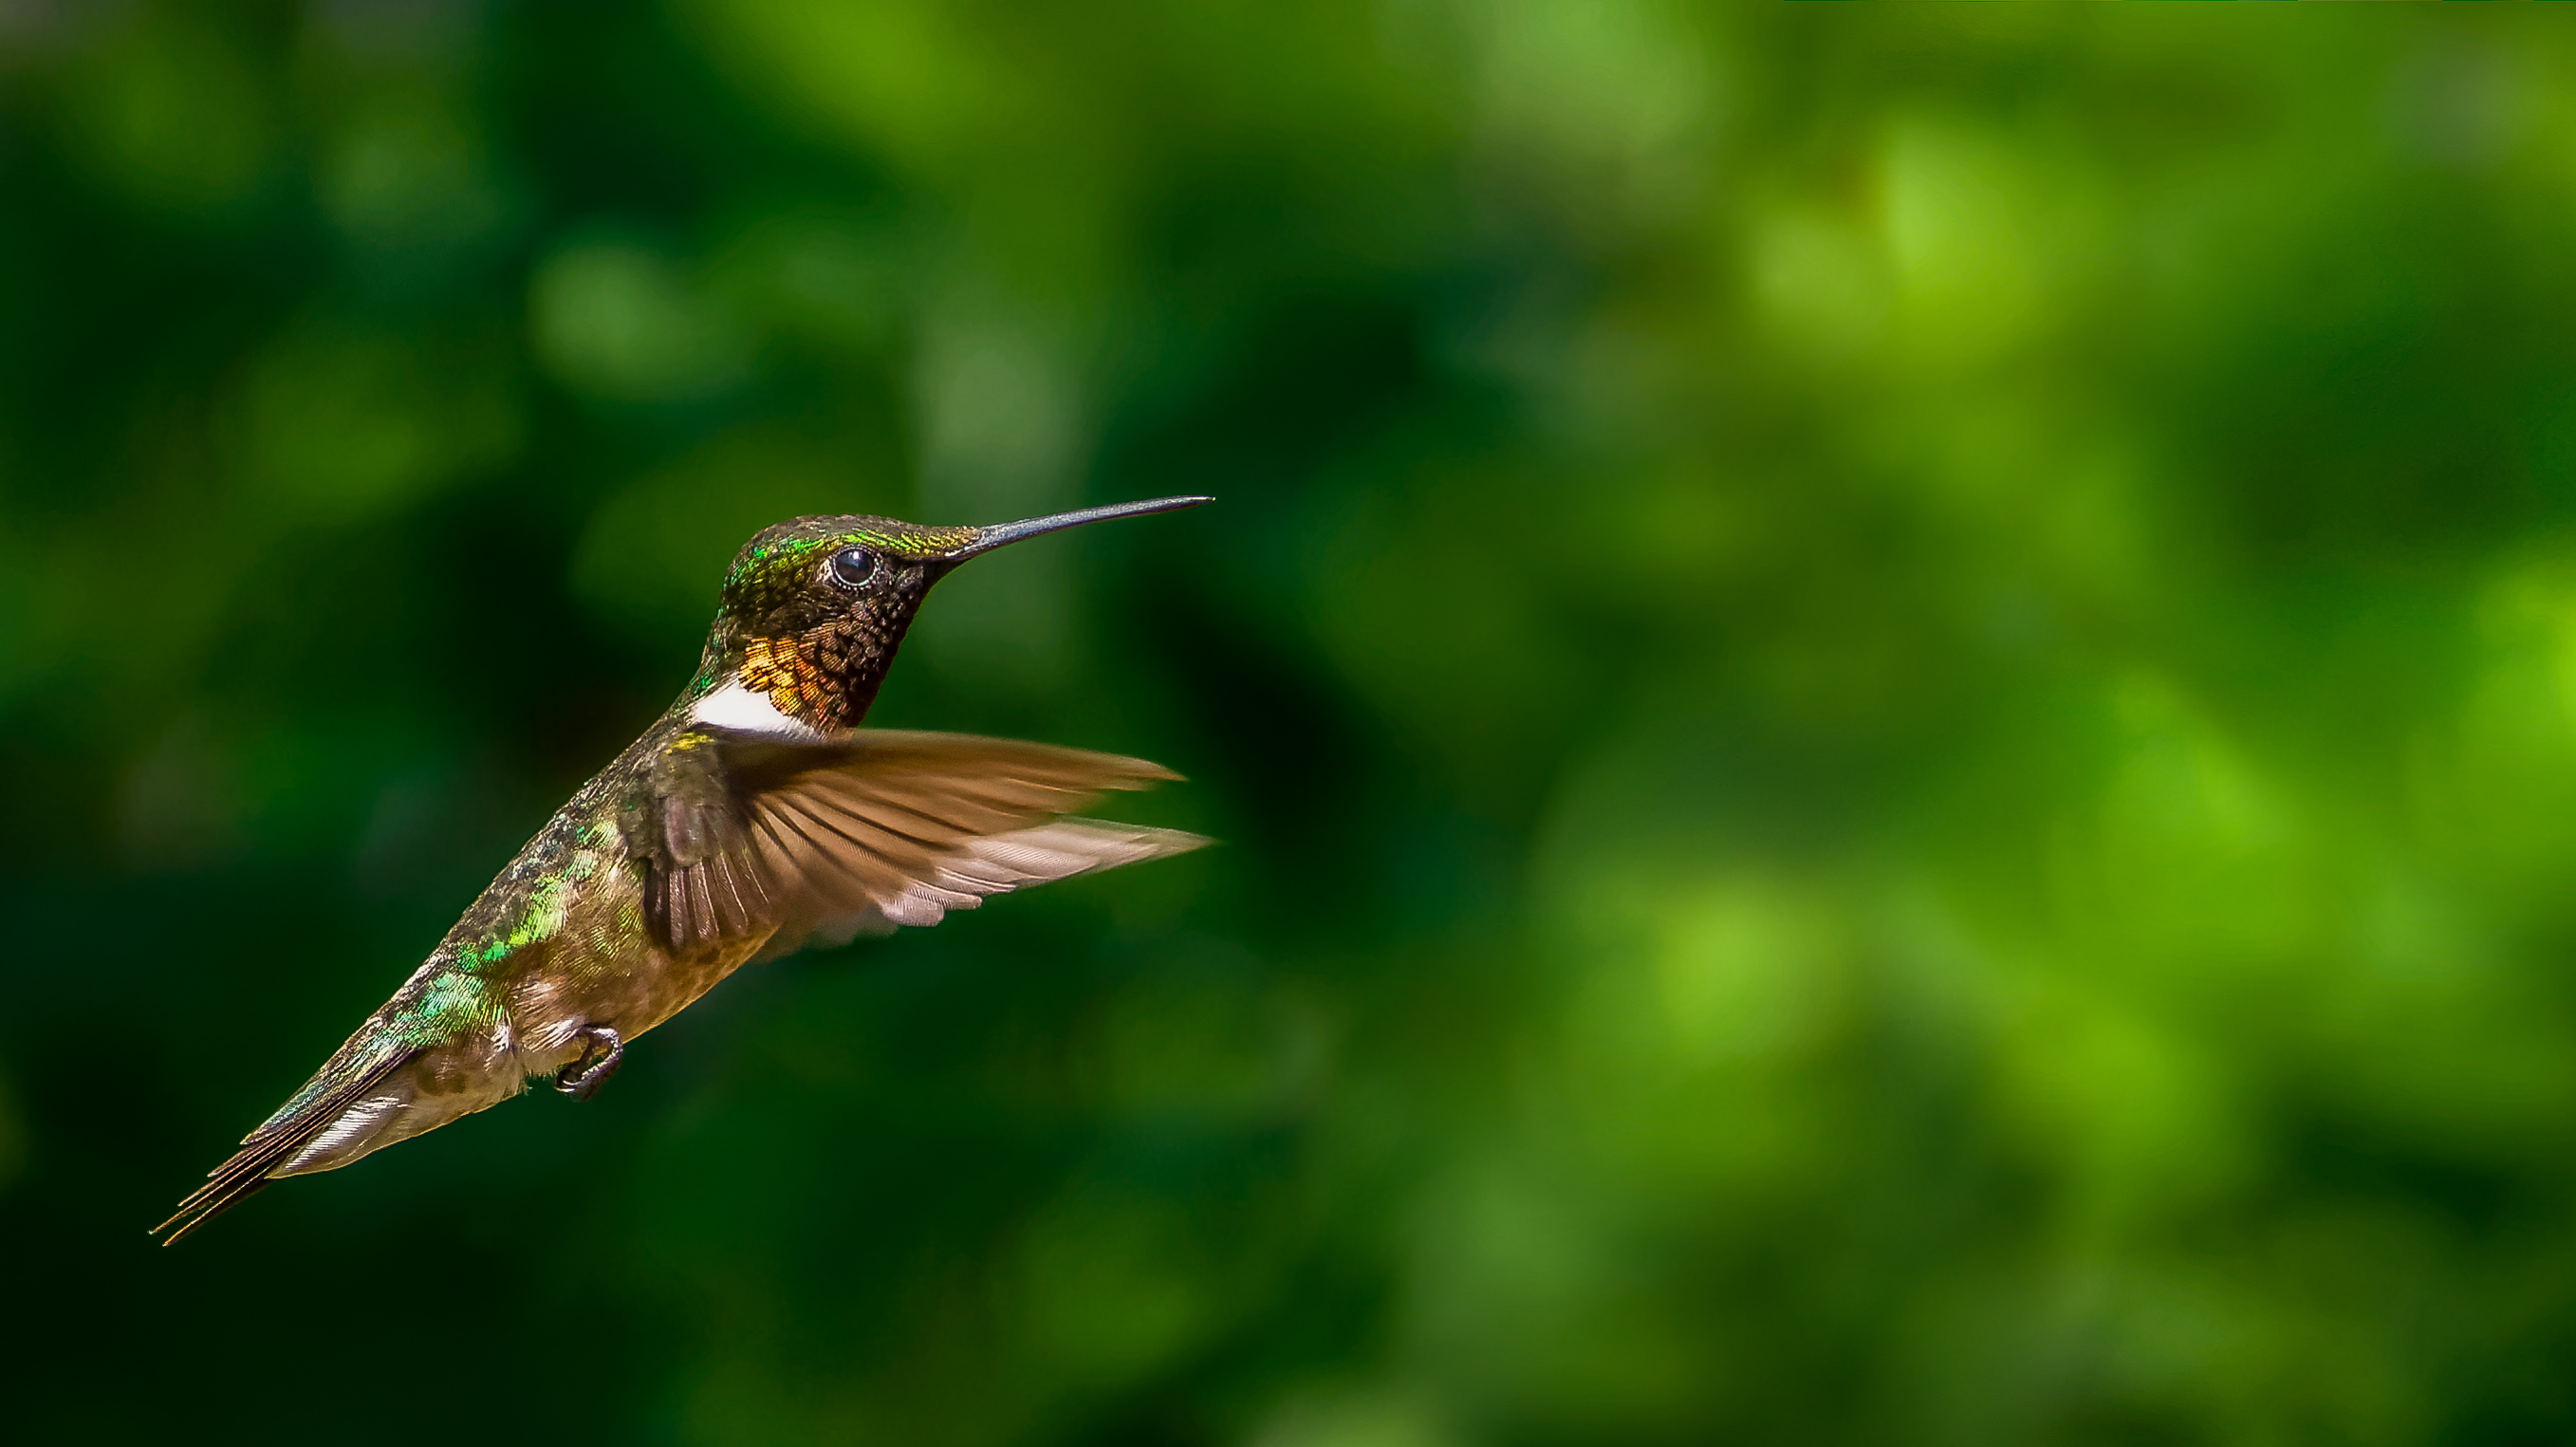 Re: Motion sensor trail camera for hummingbird photography